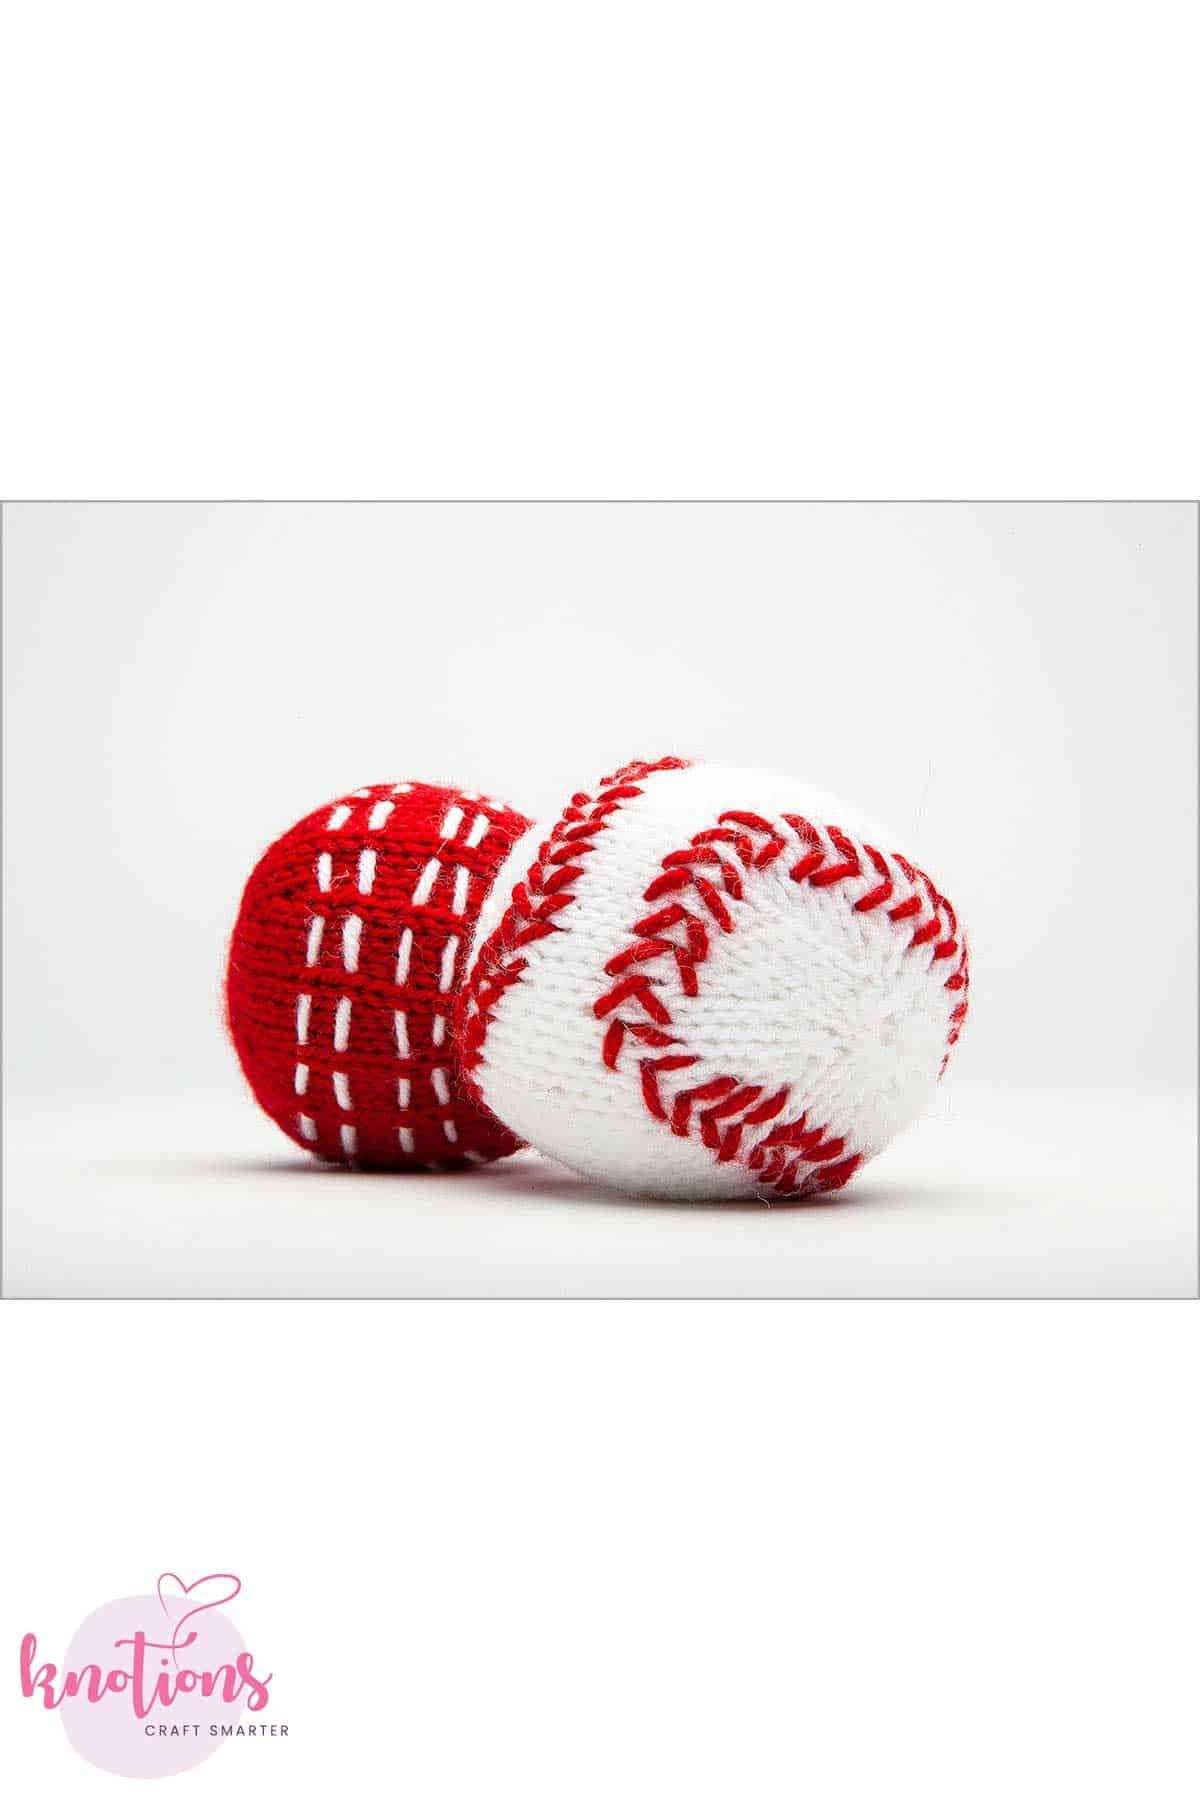 baseball-cricketball-3